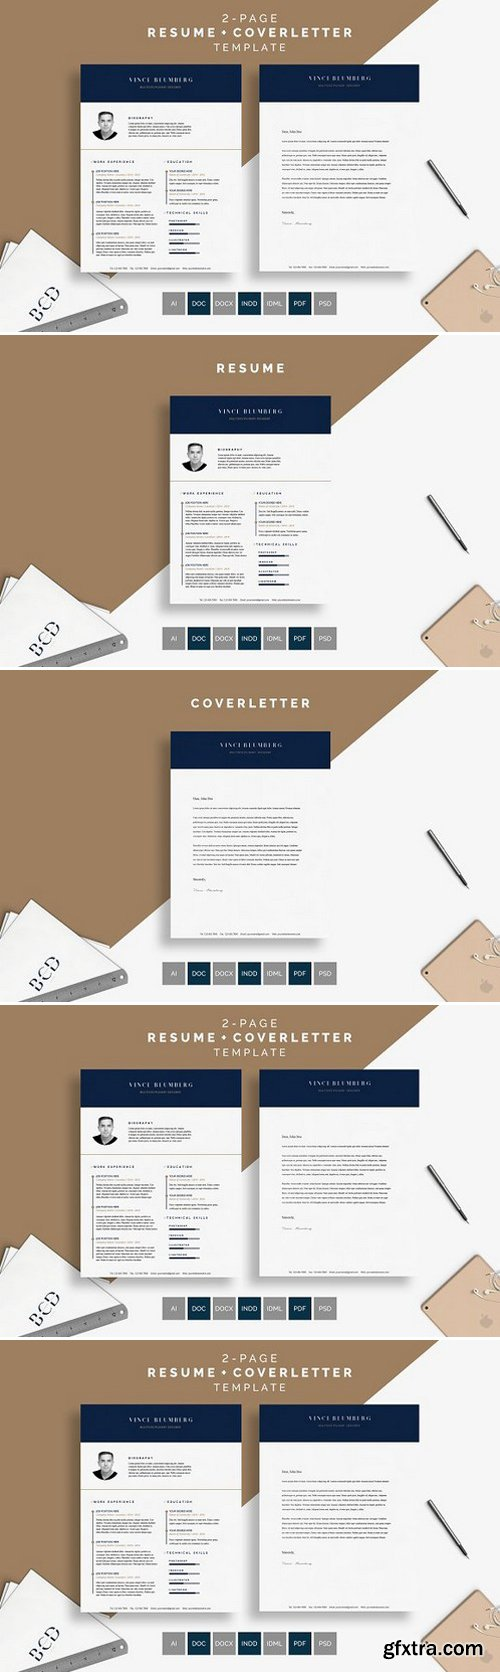 CM - Resume/CV - Vince 885239